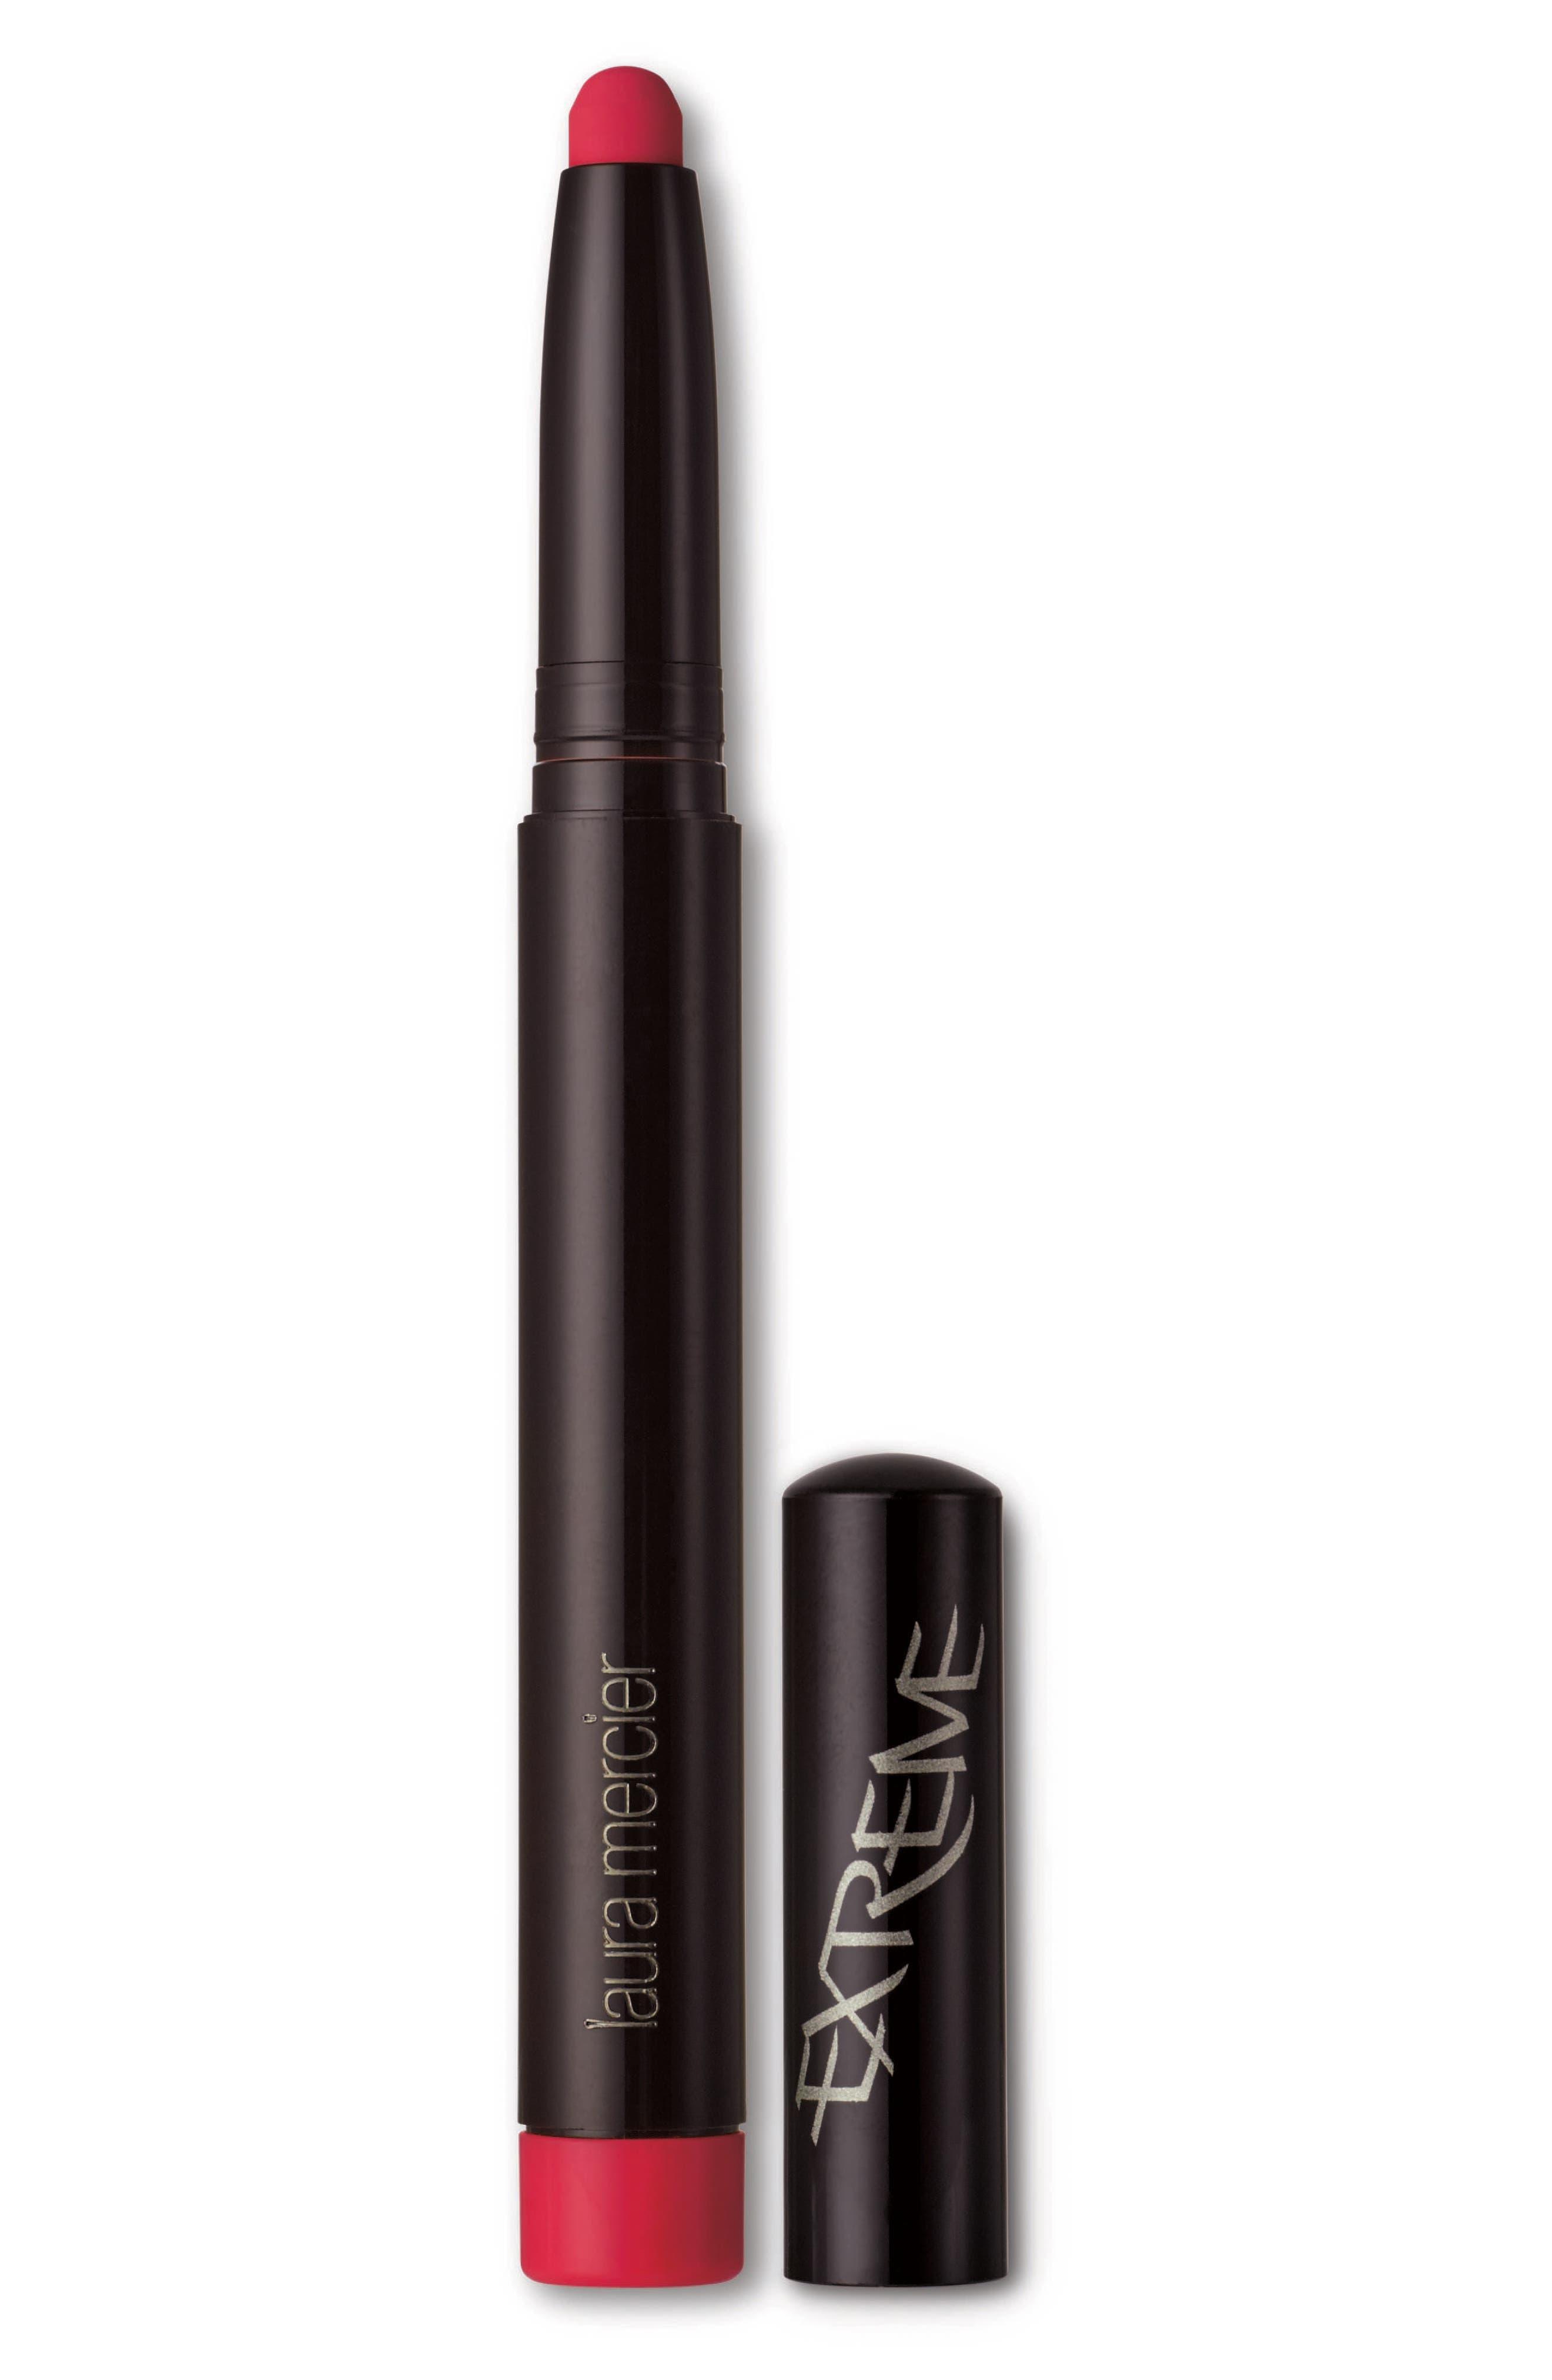 Main Image - Laura Mercier Velour Extreme Matte Lipstick